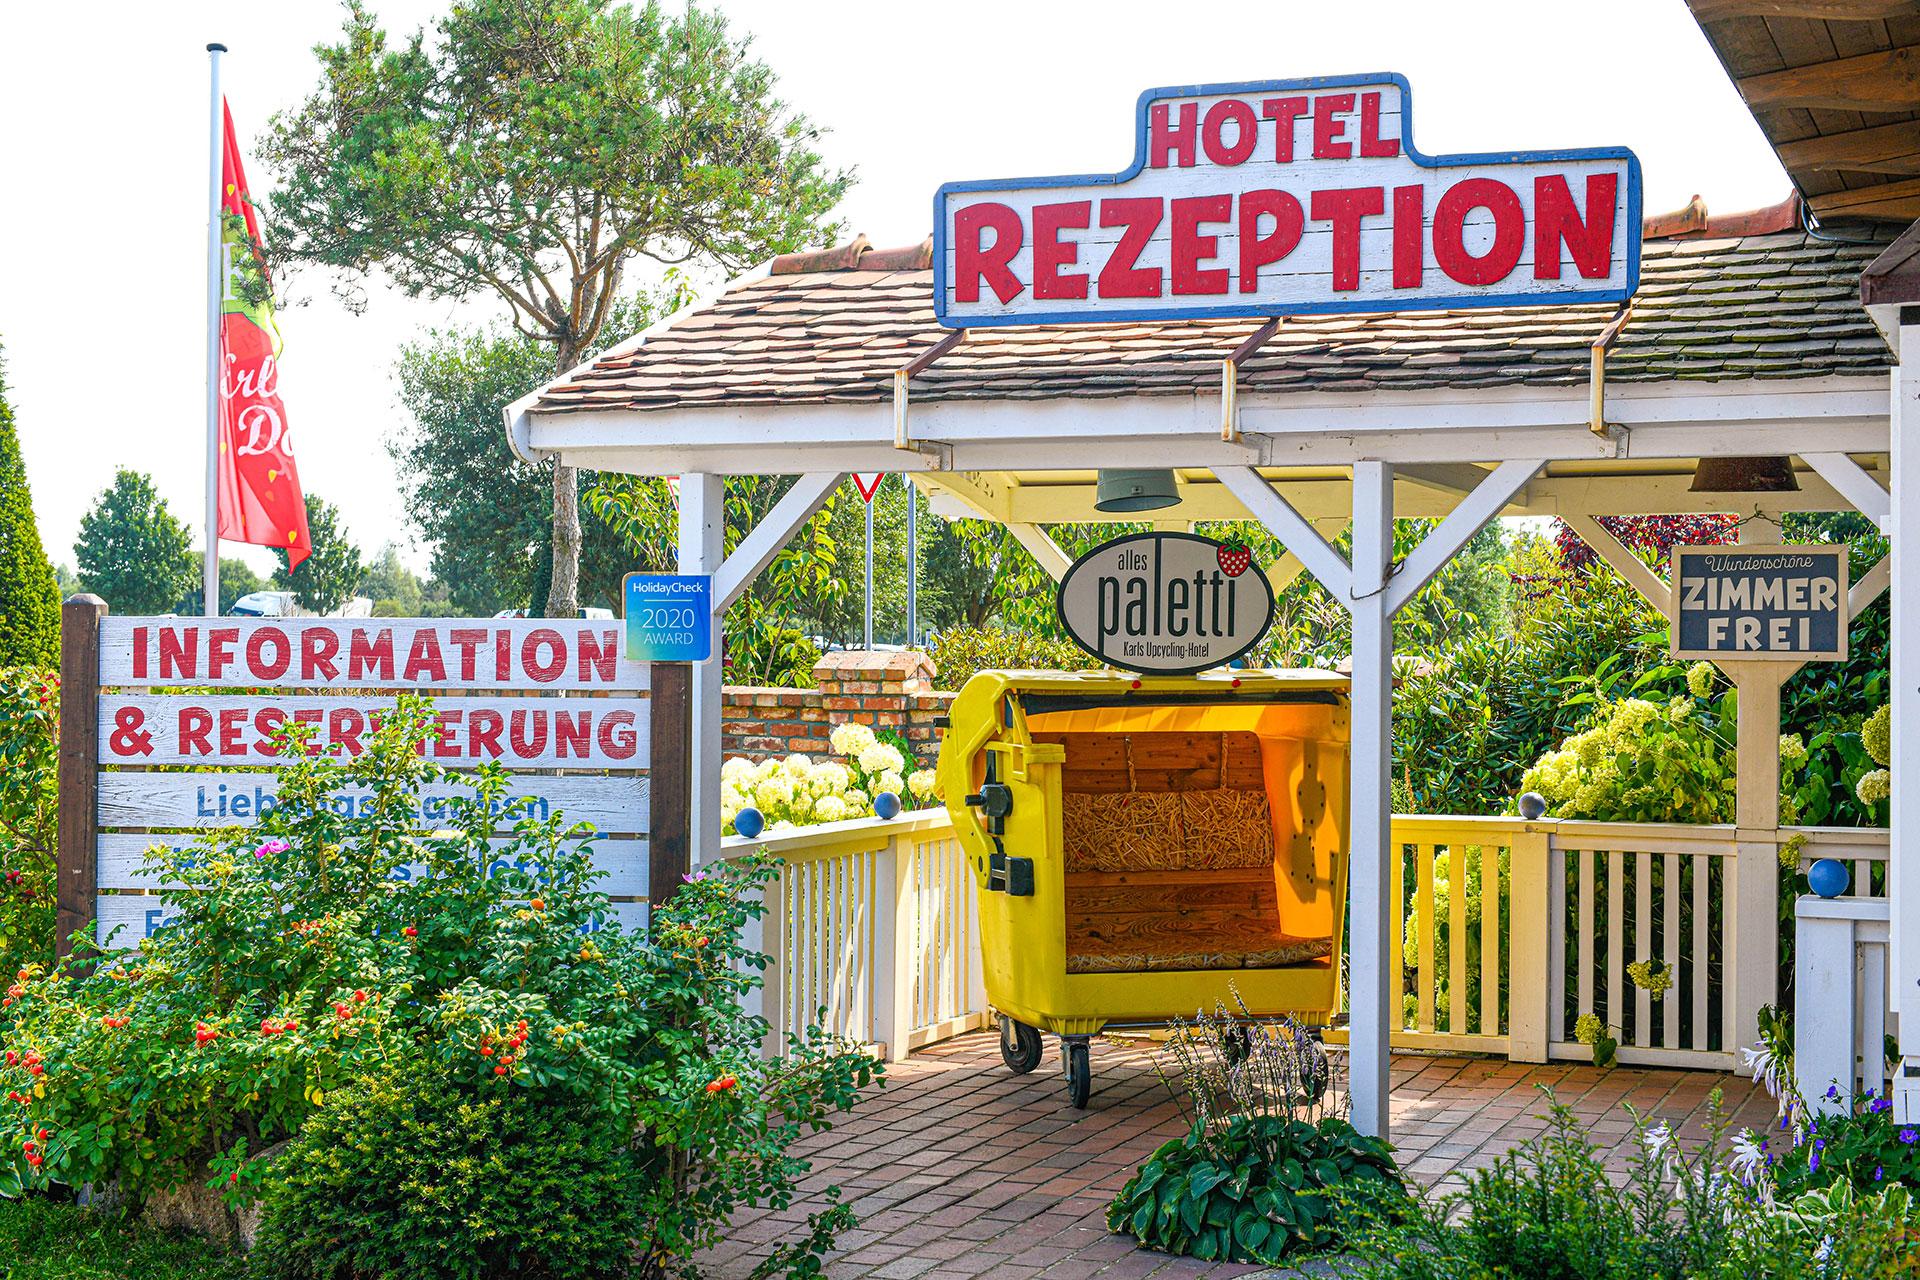 Rezeption Hotel Alles Paletti